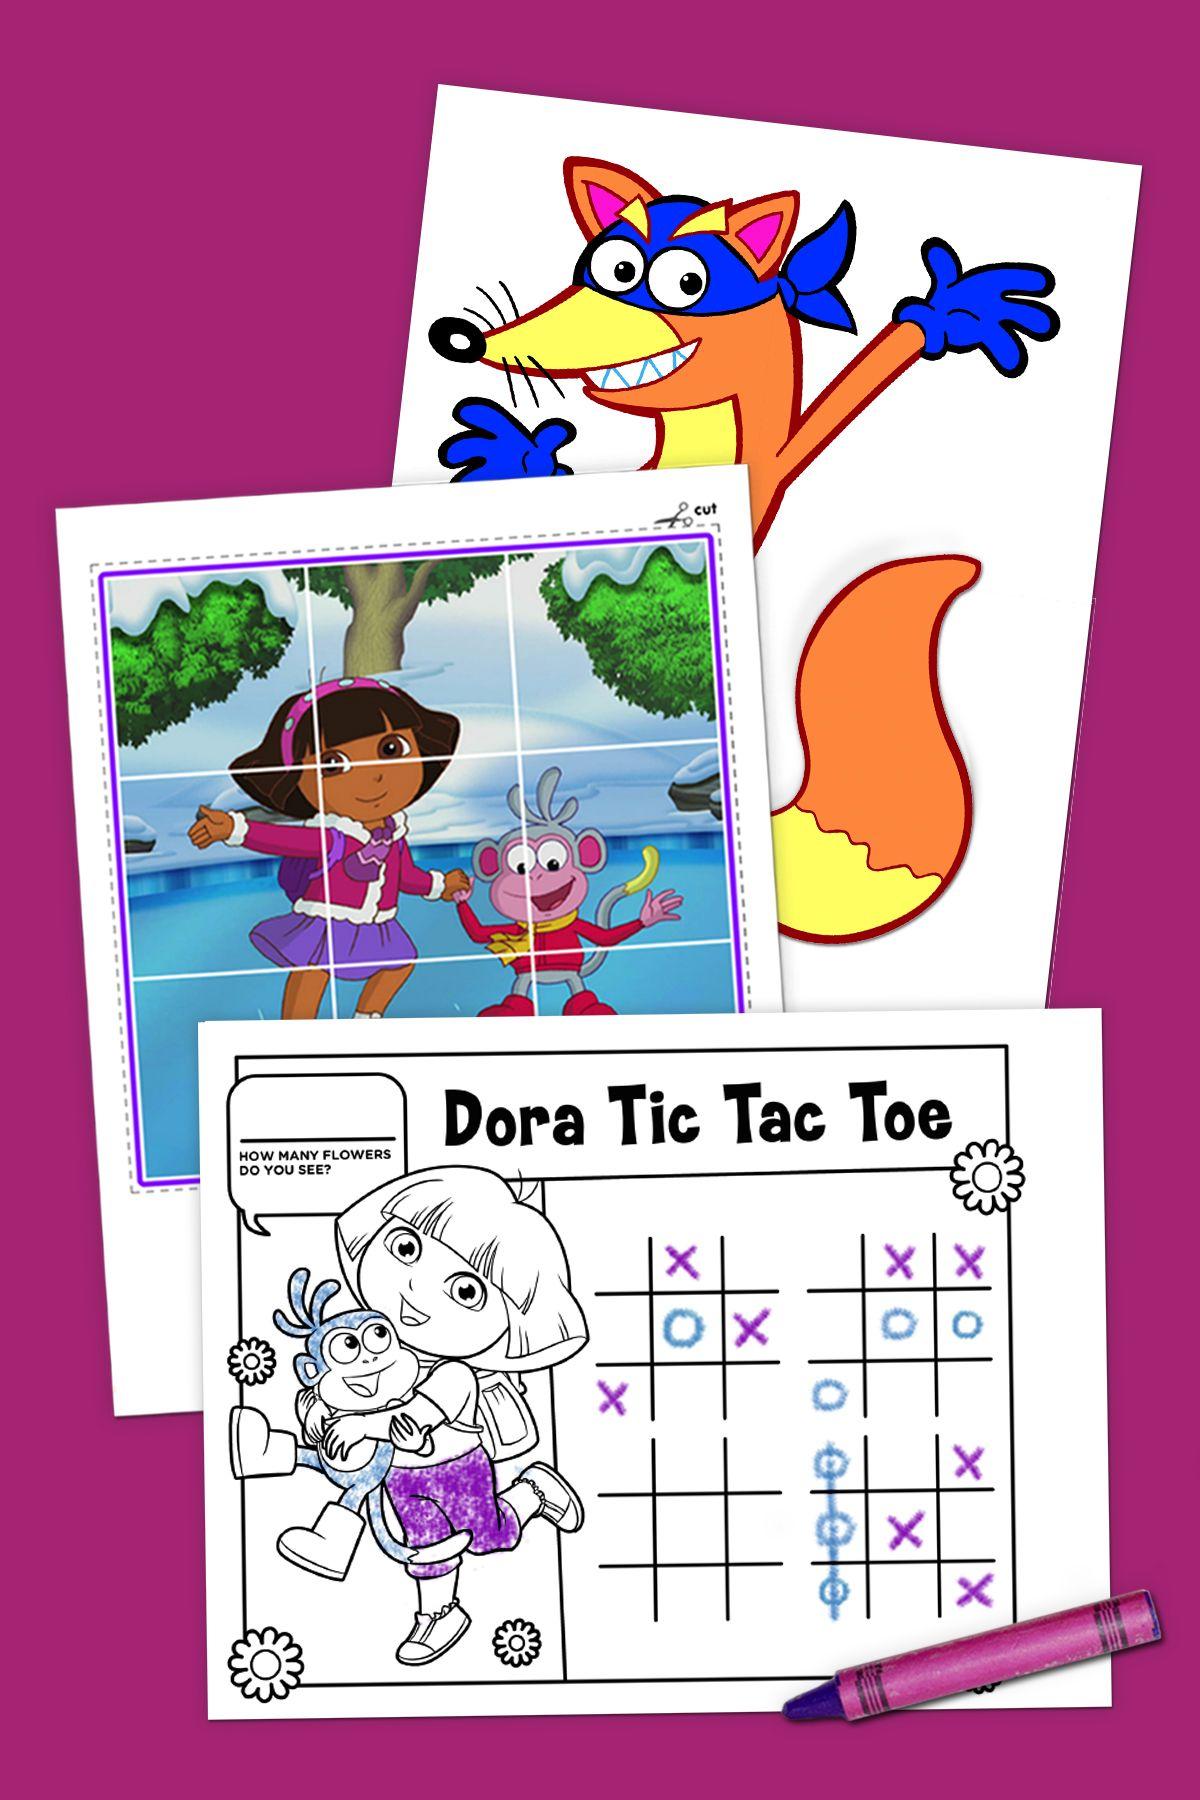 Top 10 Dora The Explorer Printables Of All Time Dora The Explorer Dora Explorer Birthday Party [ 1800 x 1200 Pixel ]